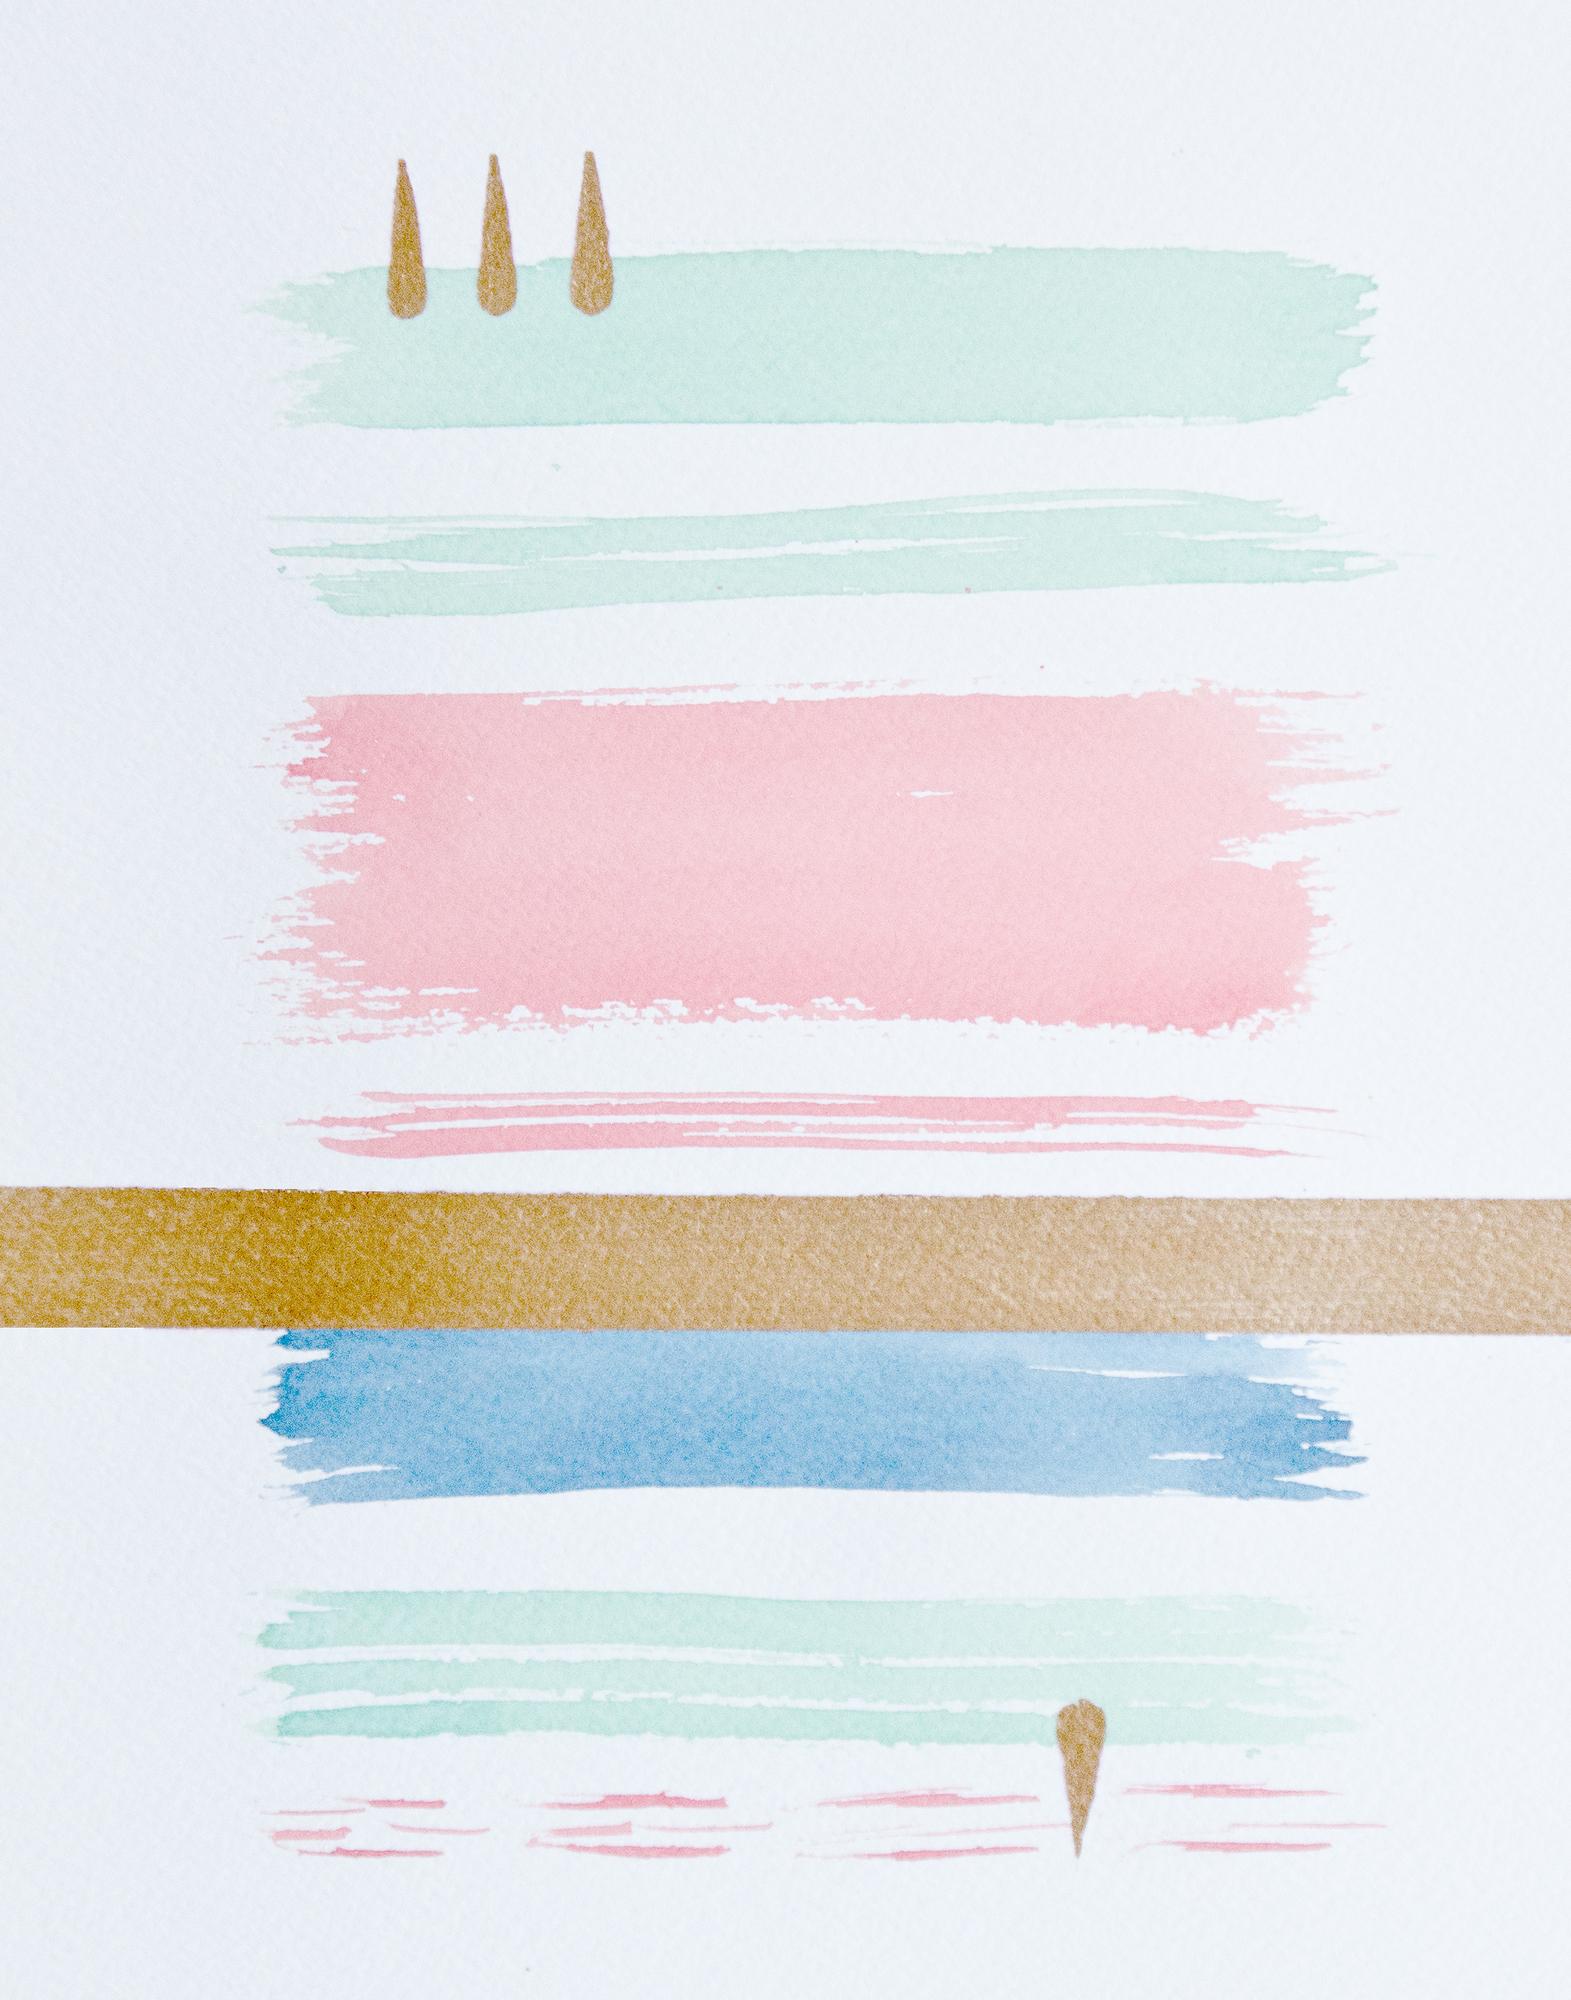 DIY watercolor art PRINTABLE via Year of Serendipity